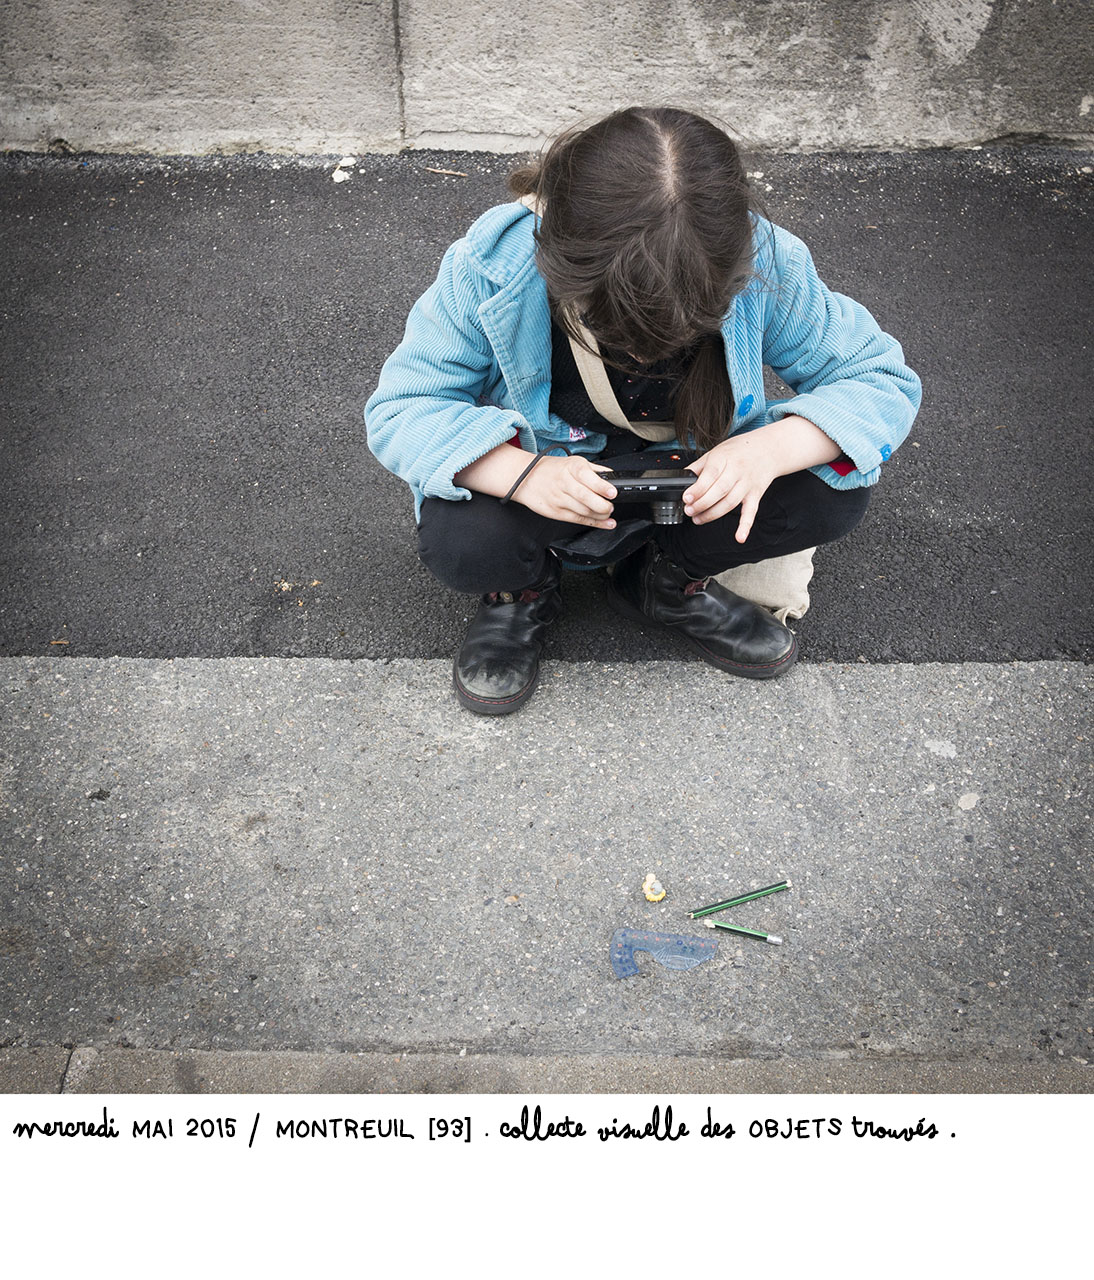 Brouillard Journalier, Brouillon Perpetuel. 1996_2019 - © Sophie Loubaton.